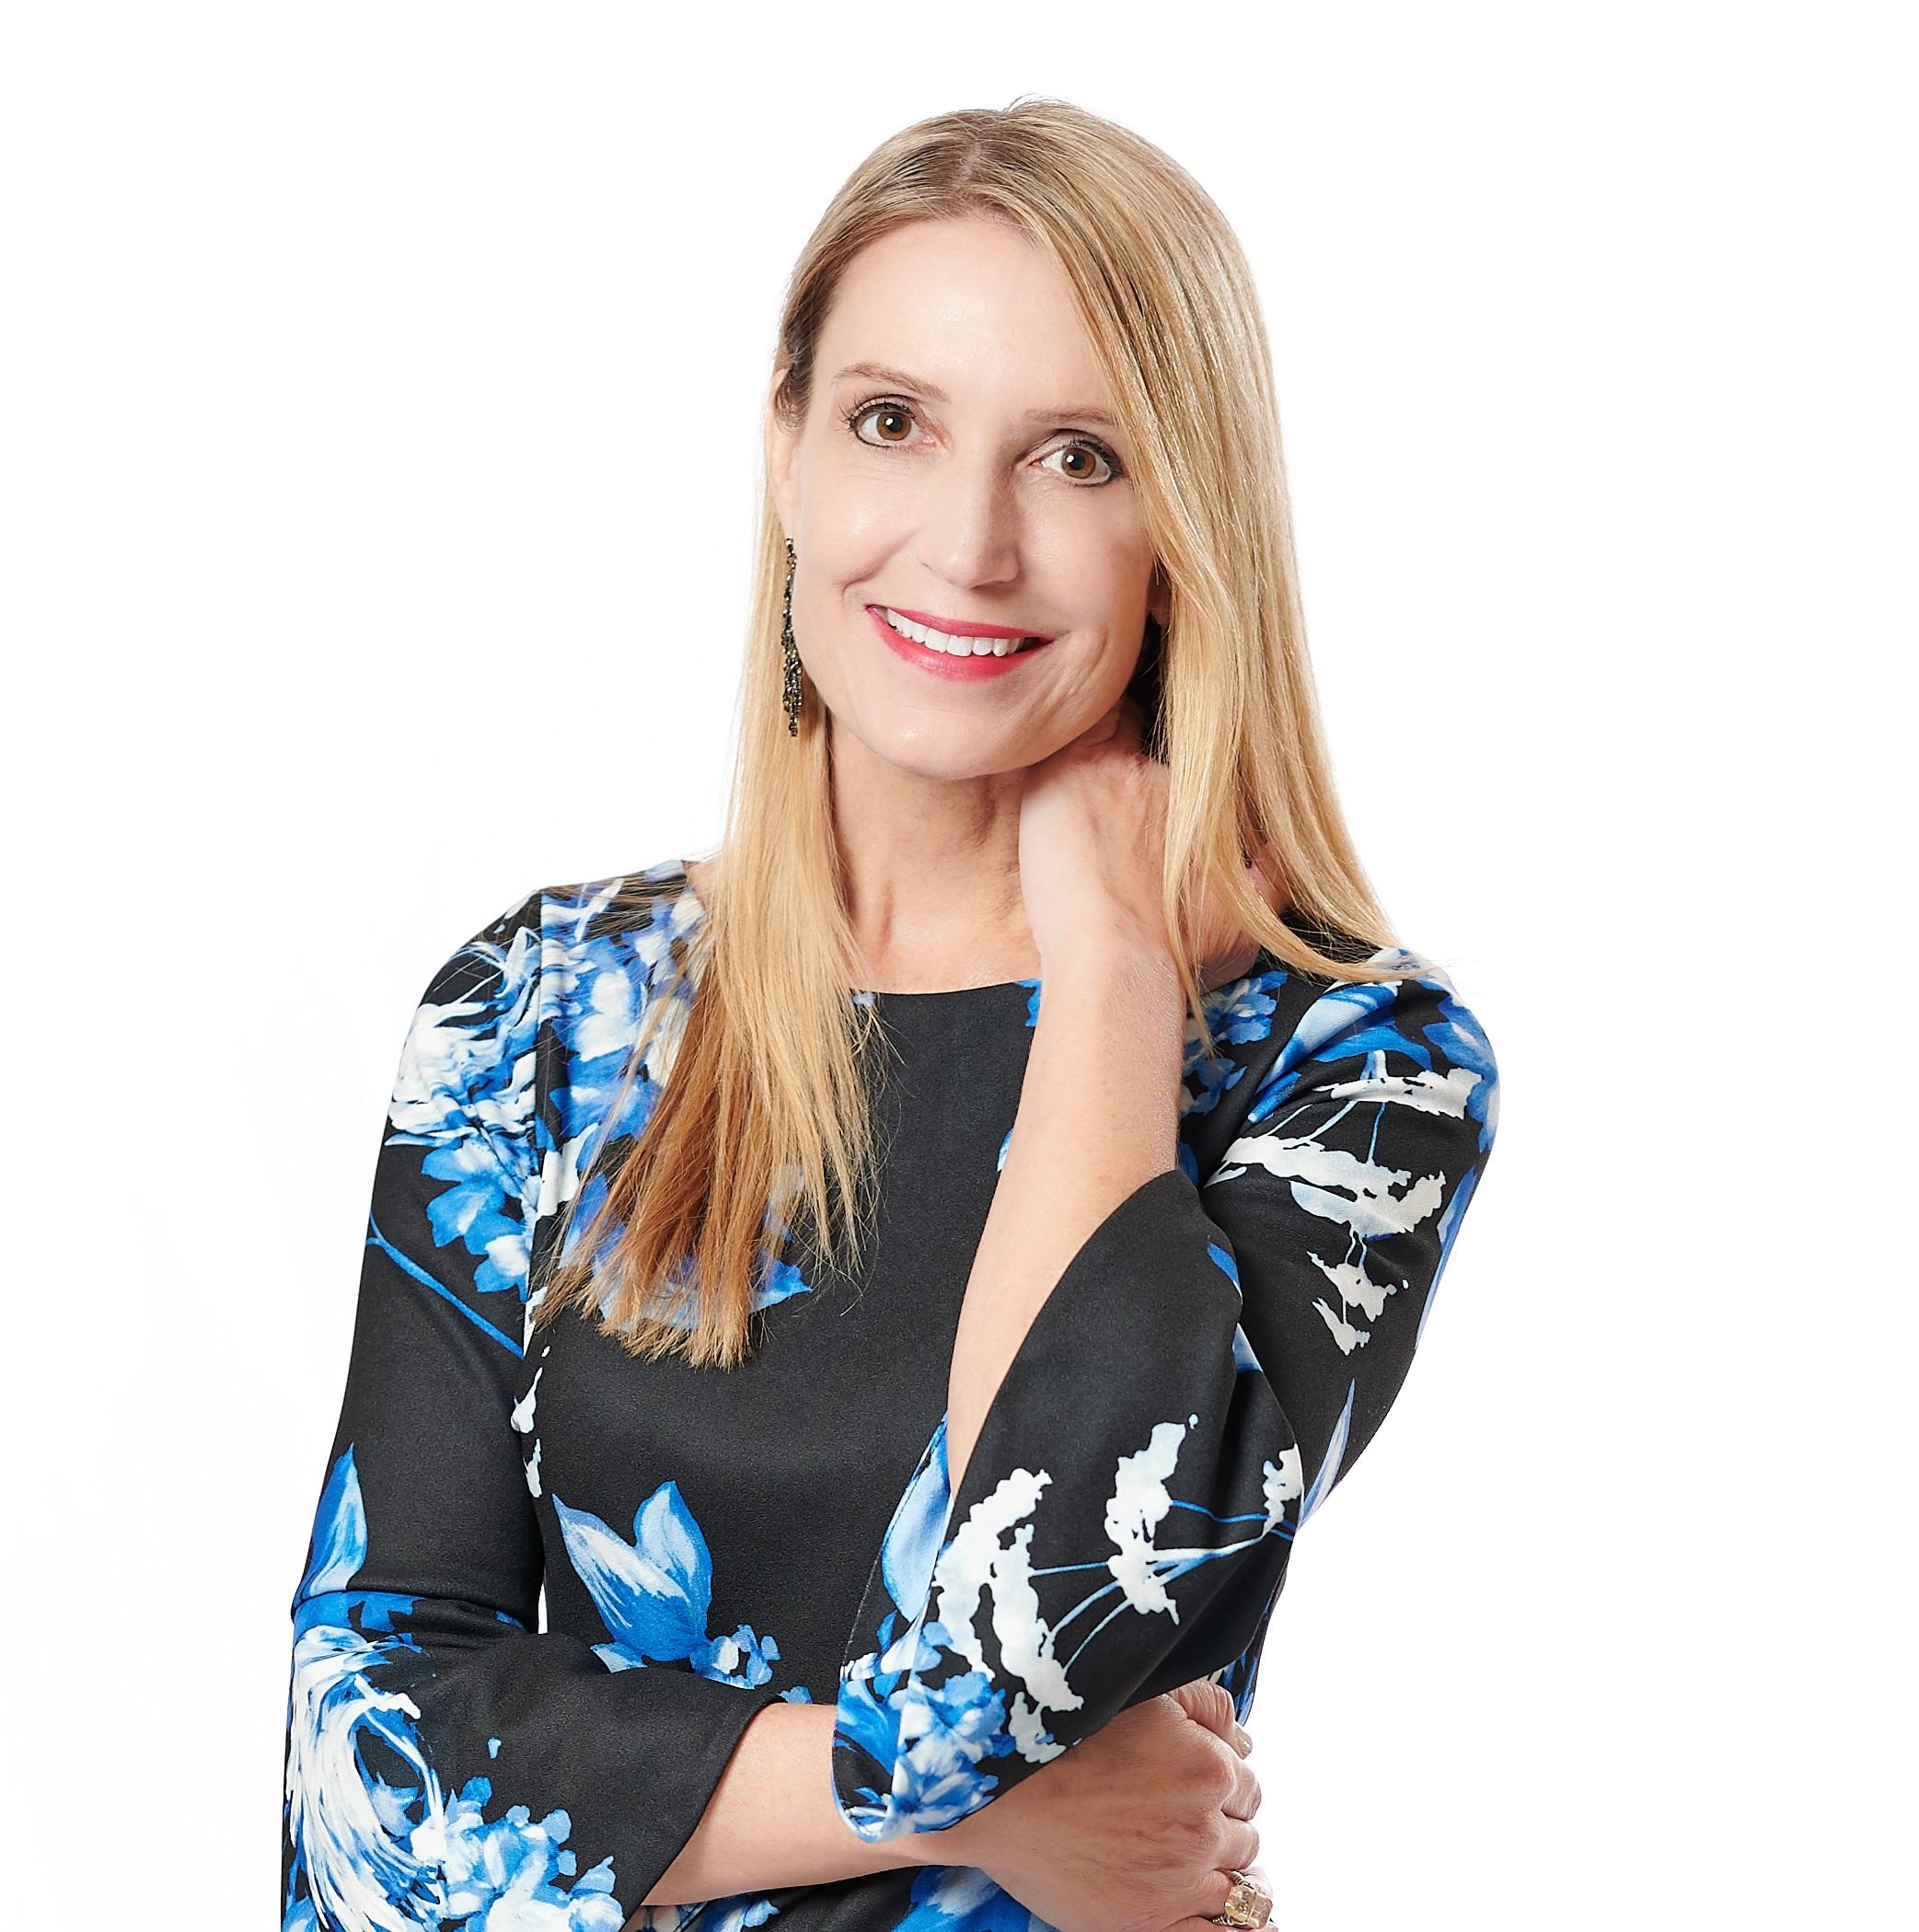 Charlene Walters PhD